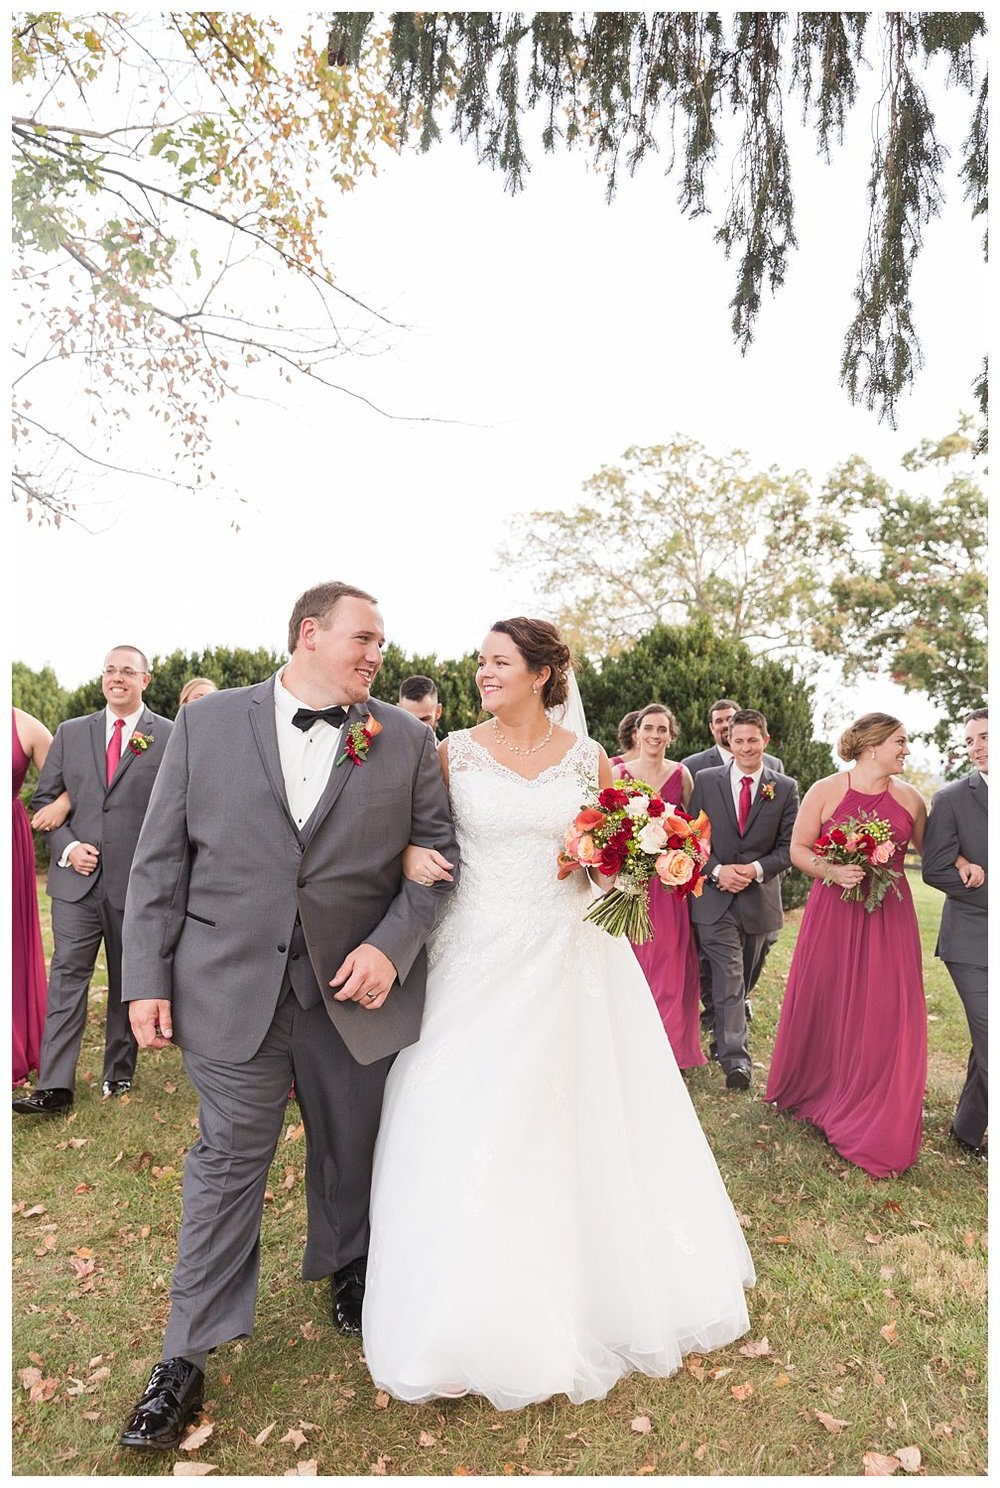 elovephotos gaie lea staunton virginia fall wedding photography_1117.jpg